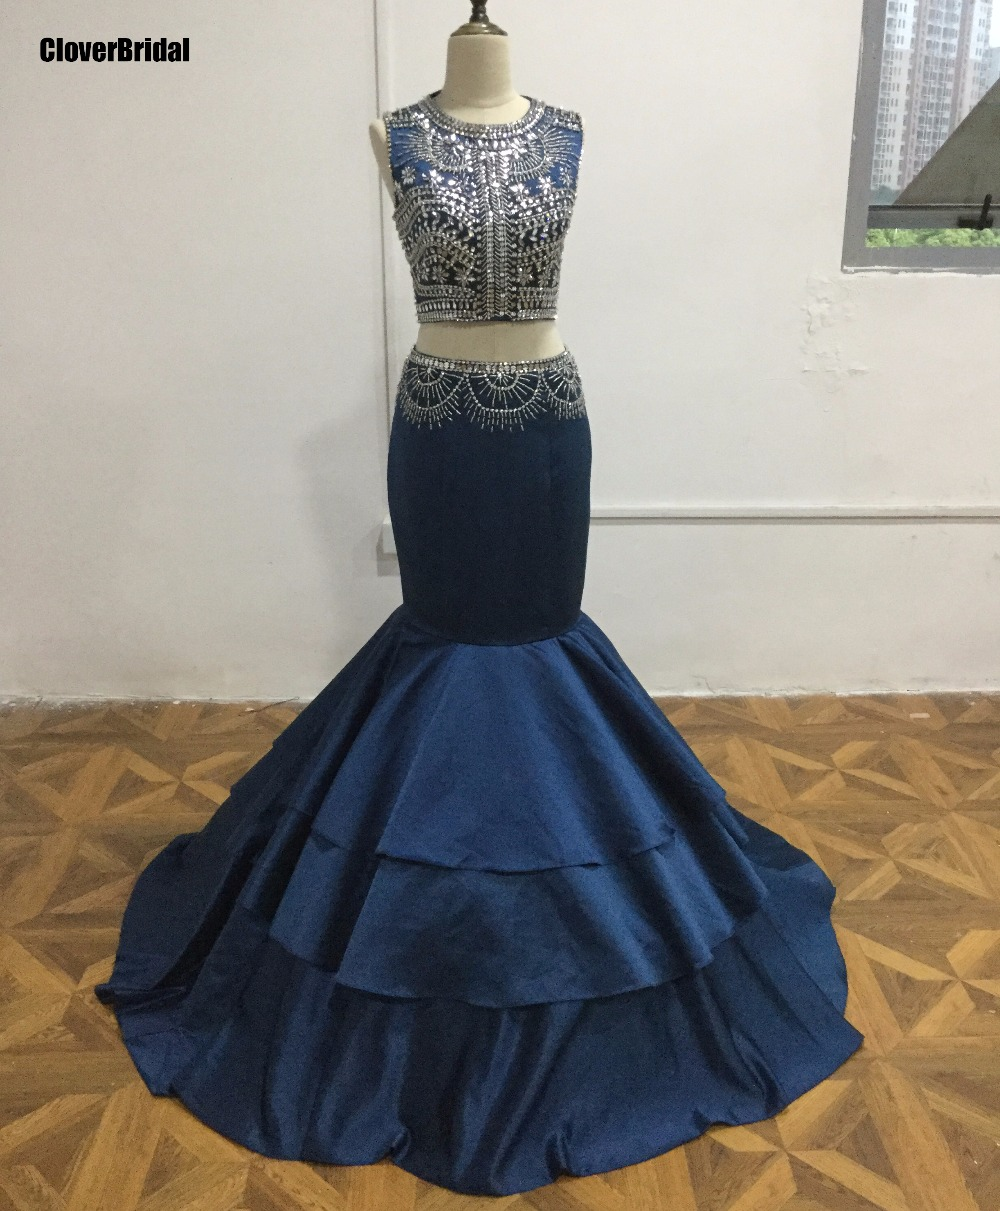 Bling bling beading crystal stones acrylic stones navy blue 2 piece   prom     dresses   mermaid 2017 free customize evening   dress